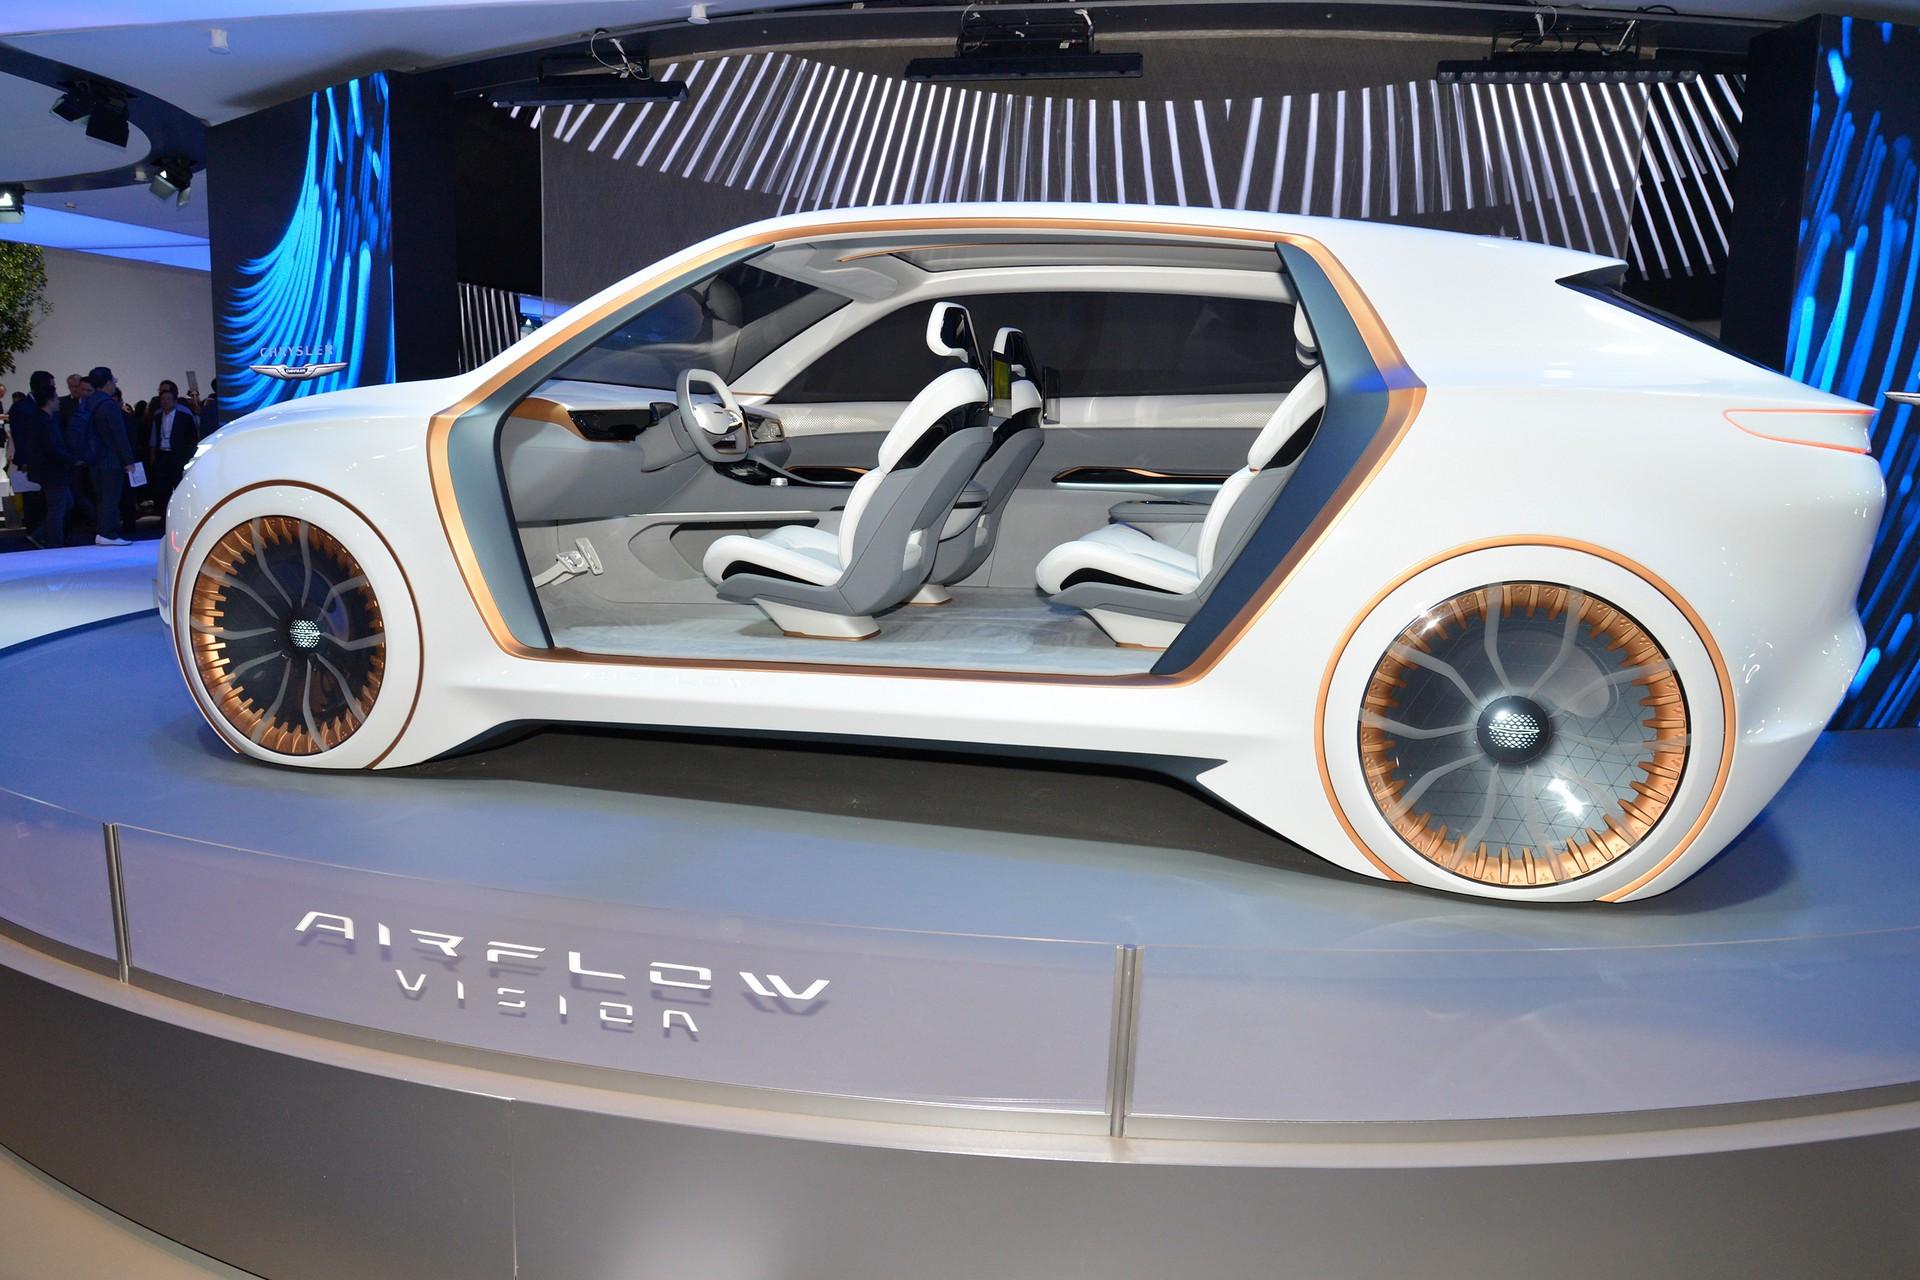 Chrysler-Airflow-Vision-Concept-2.jpeg